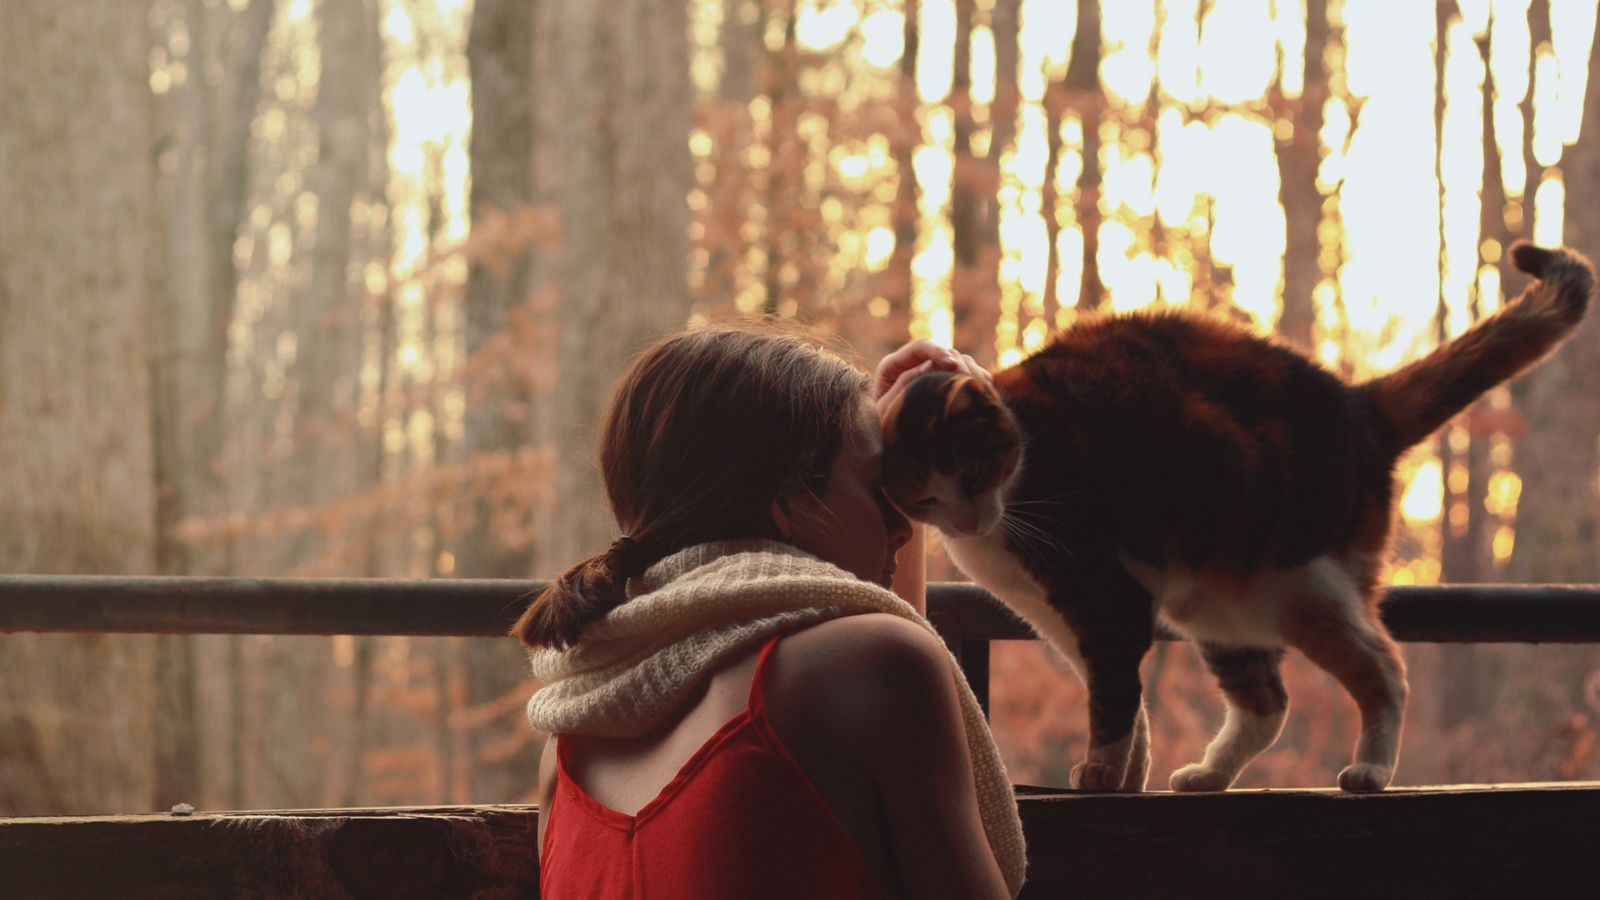 Девушка гладит трехцветную кошку